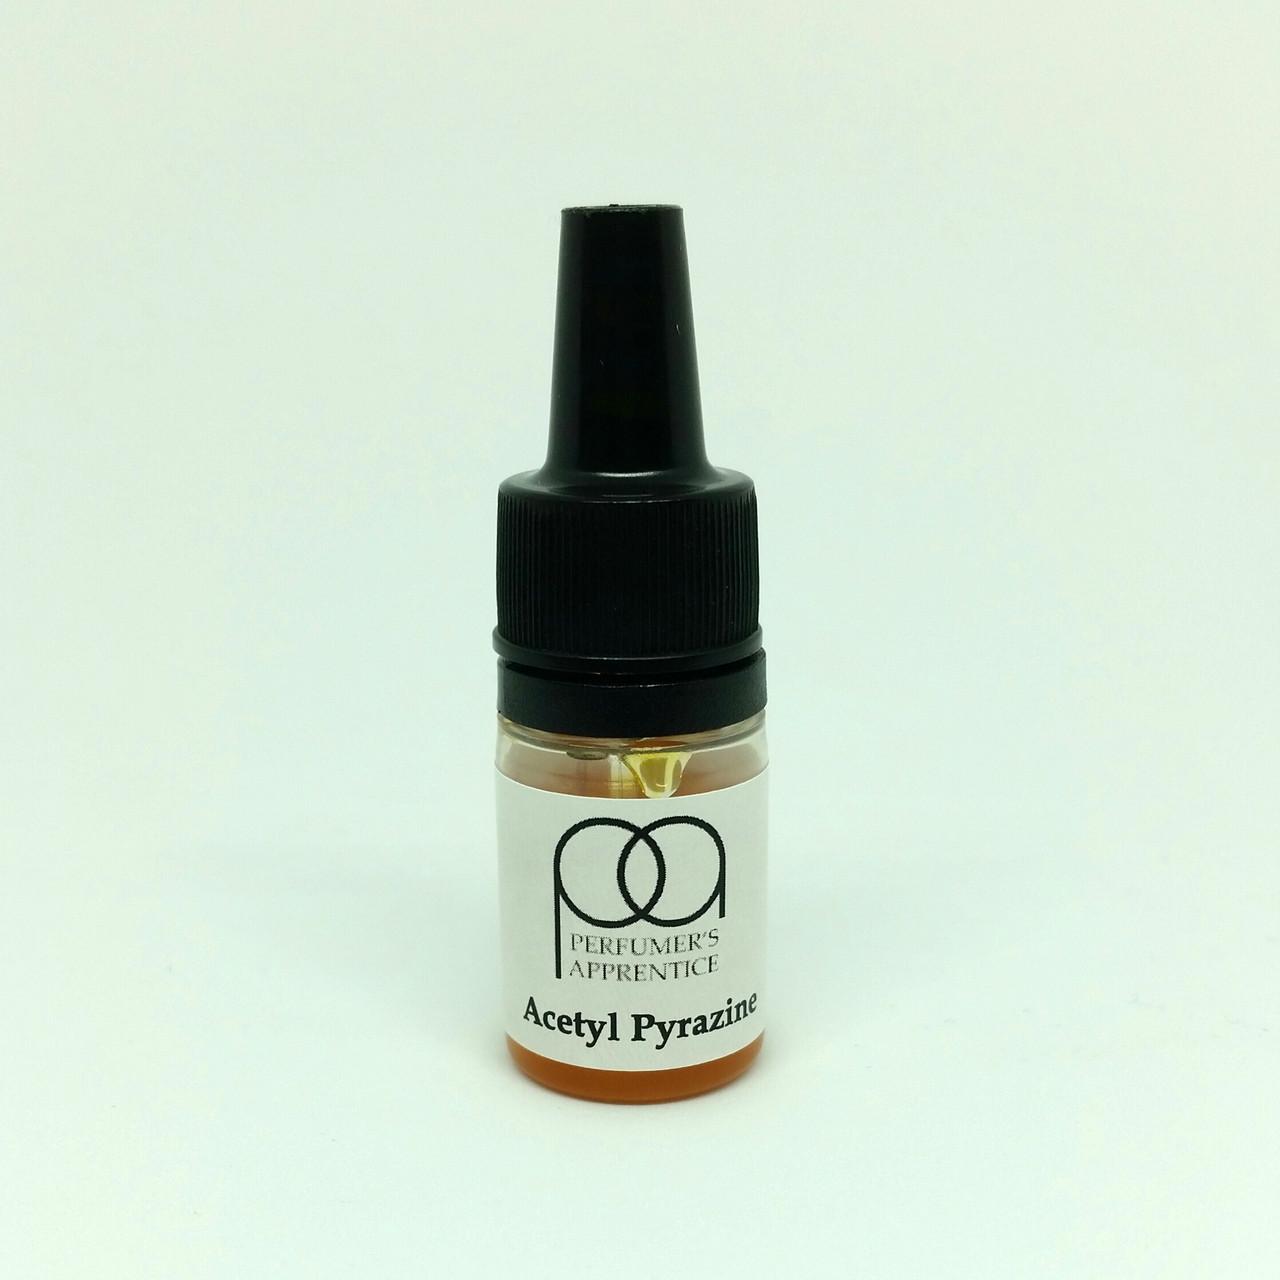 Ароматизатор TPA Acetyl Pyrazine (Ацетил Пиразин) 5 PG 5 мл - №102